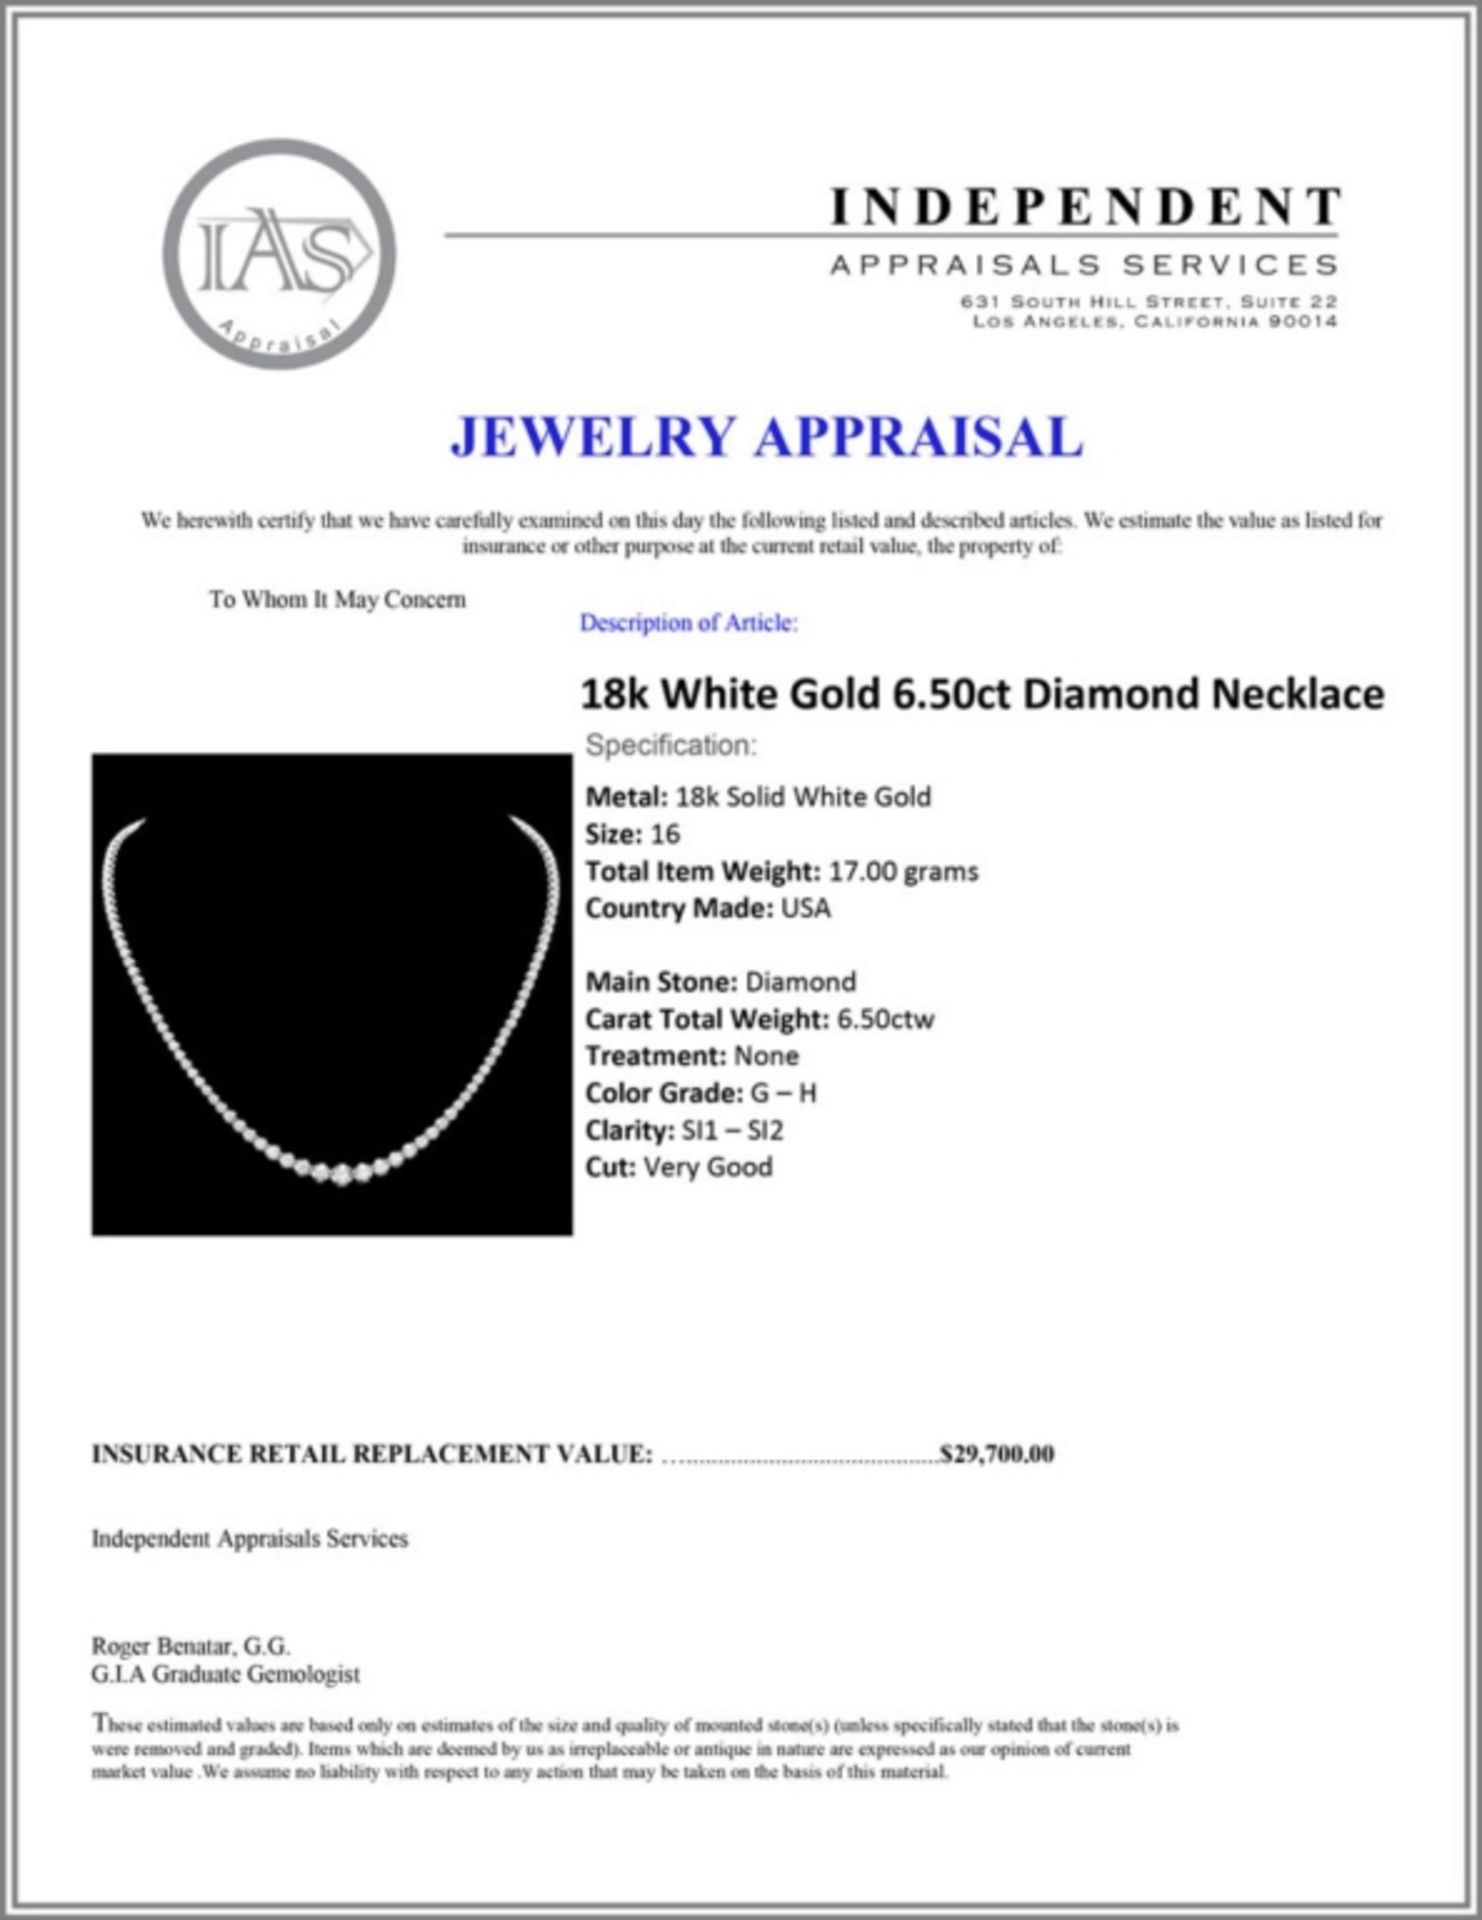 ^18k White Gold 6.50ct Diamond Necklace - Image 3 of 3